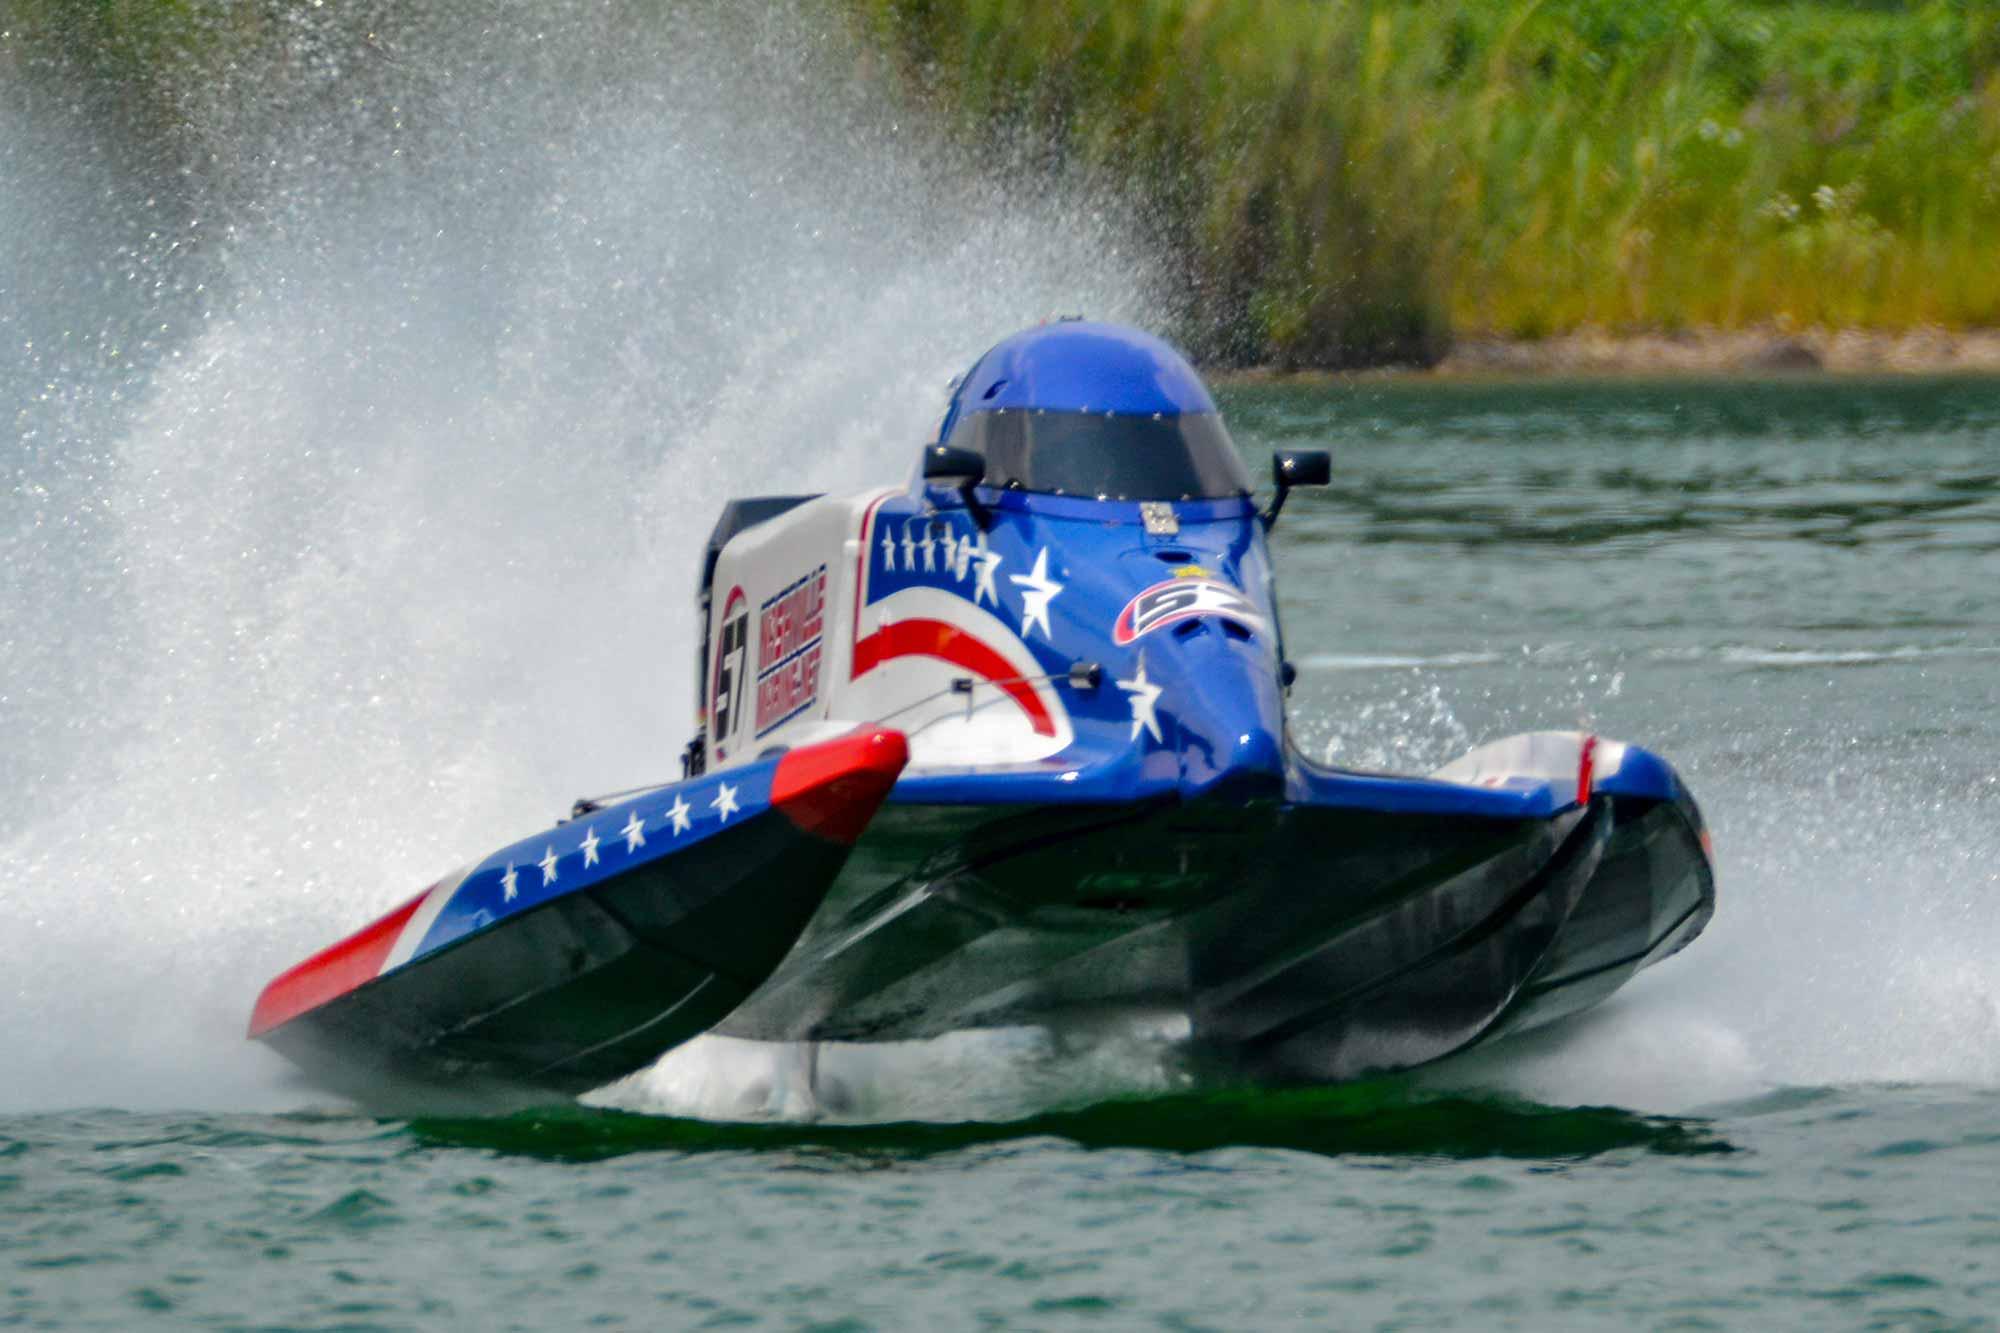 McMurray-Racing-Nashvill-Marine-2021-Springfield-F1-Race-20